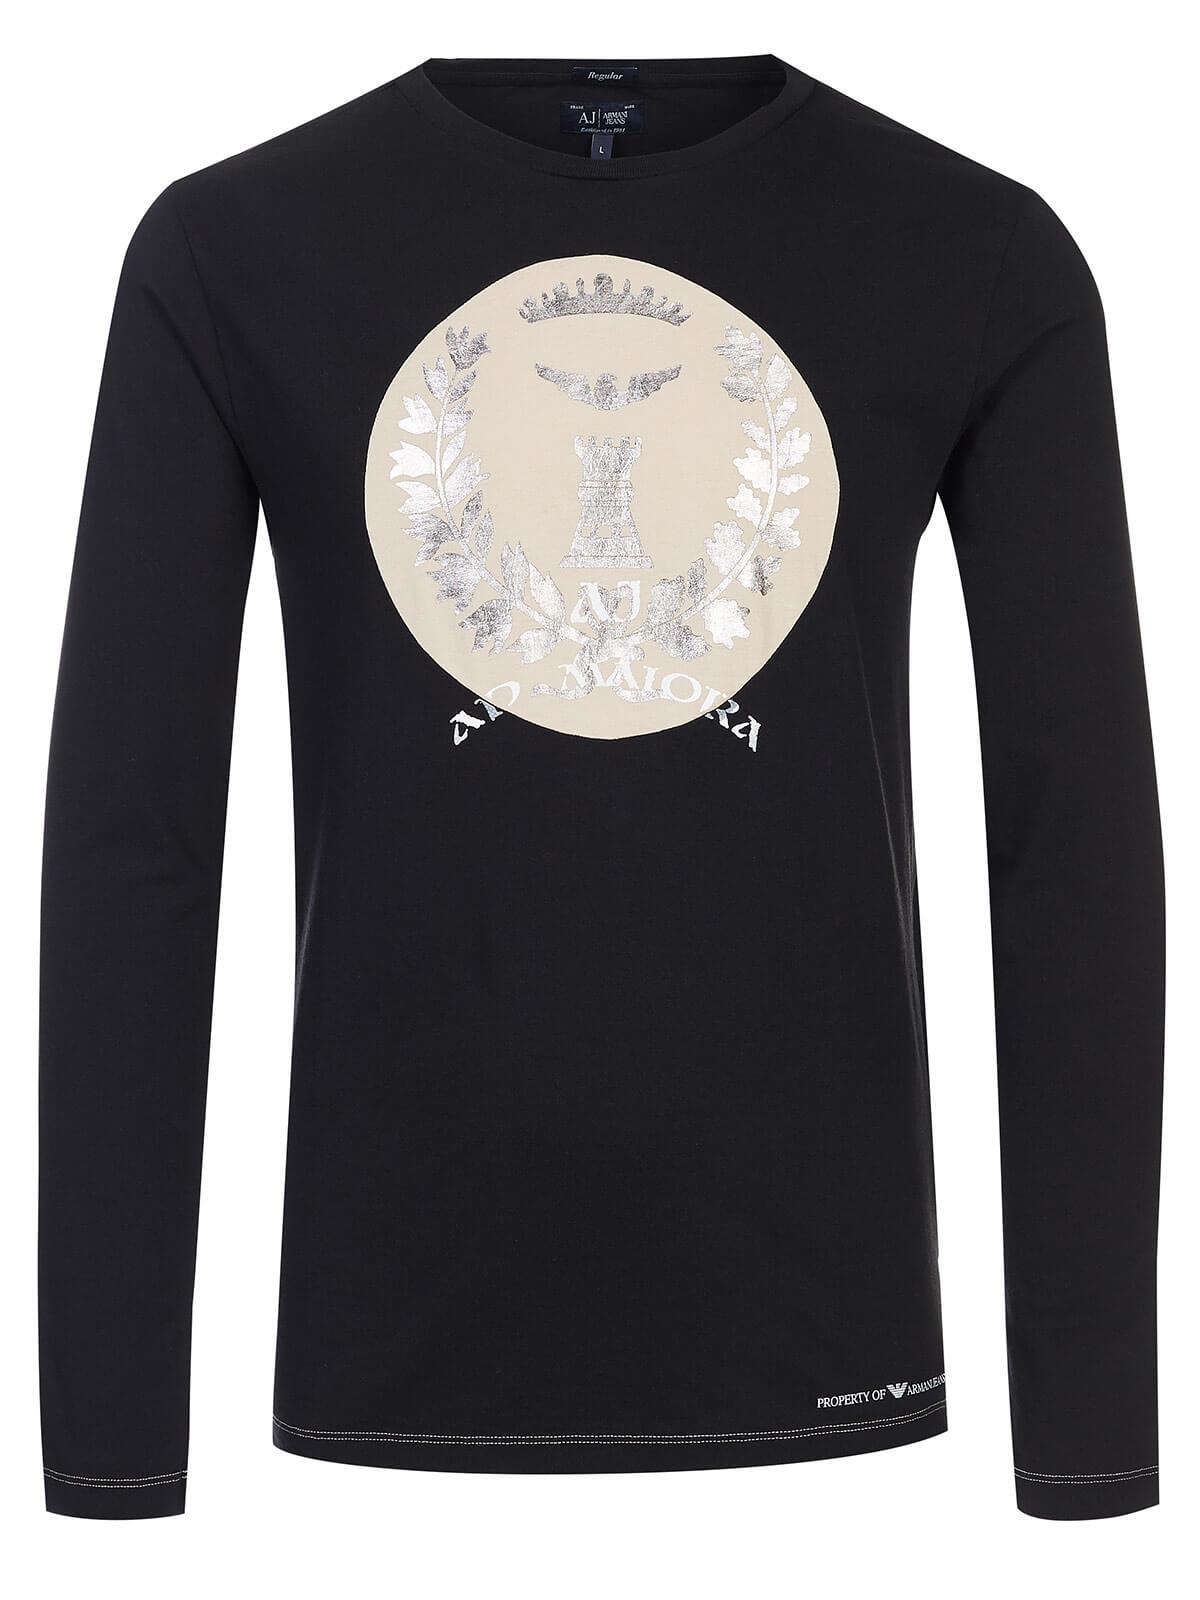 timeless design 820ba d3f6d Armani Jeans Longsleeve black